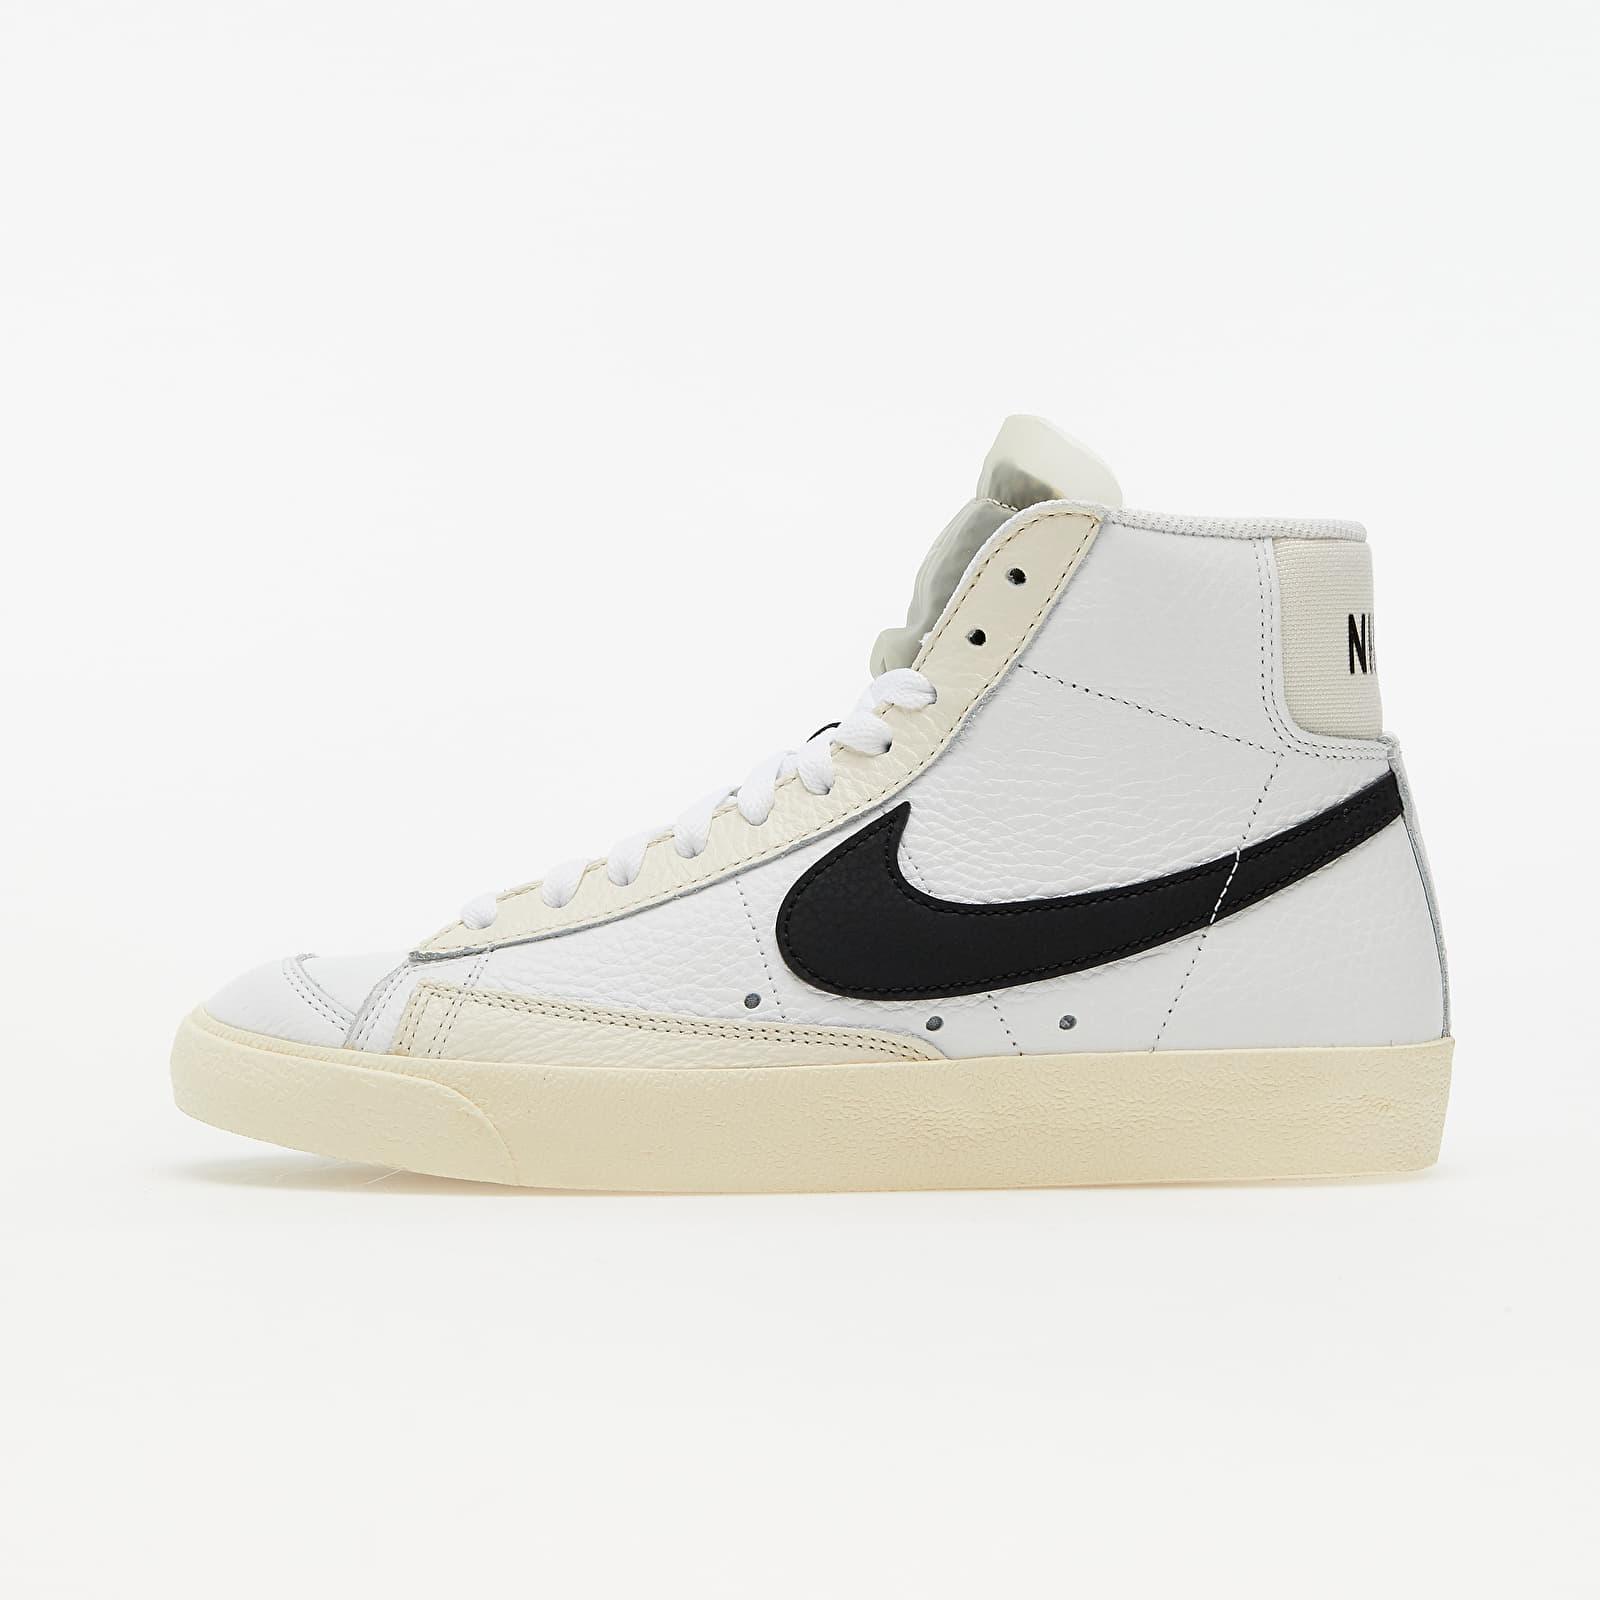 Nike Blazer Mid '77 Summit White/ Black-Pale Ivory-Beach EUR 36